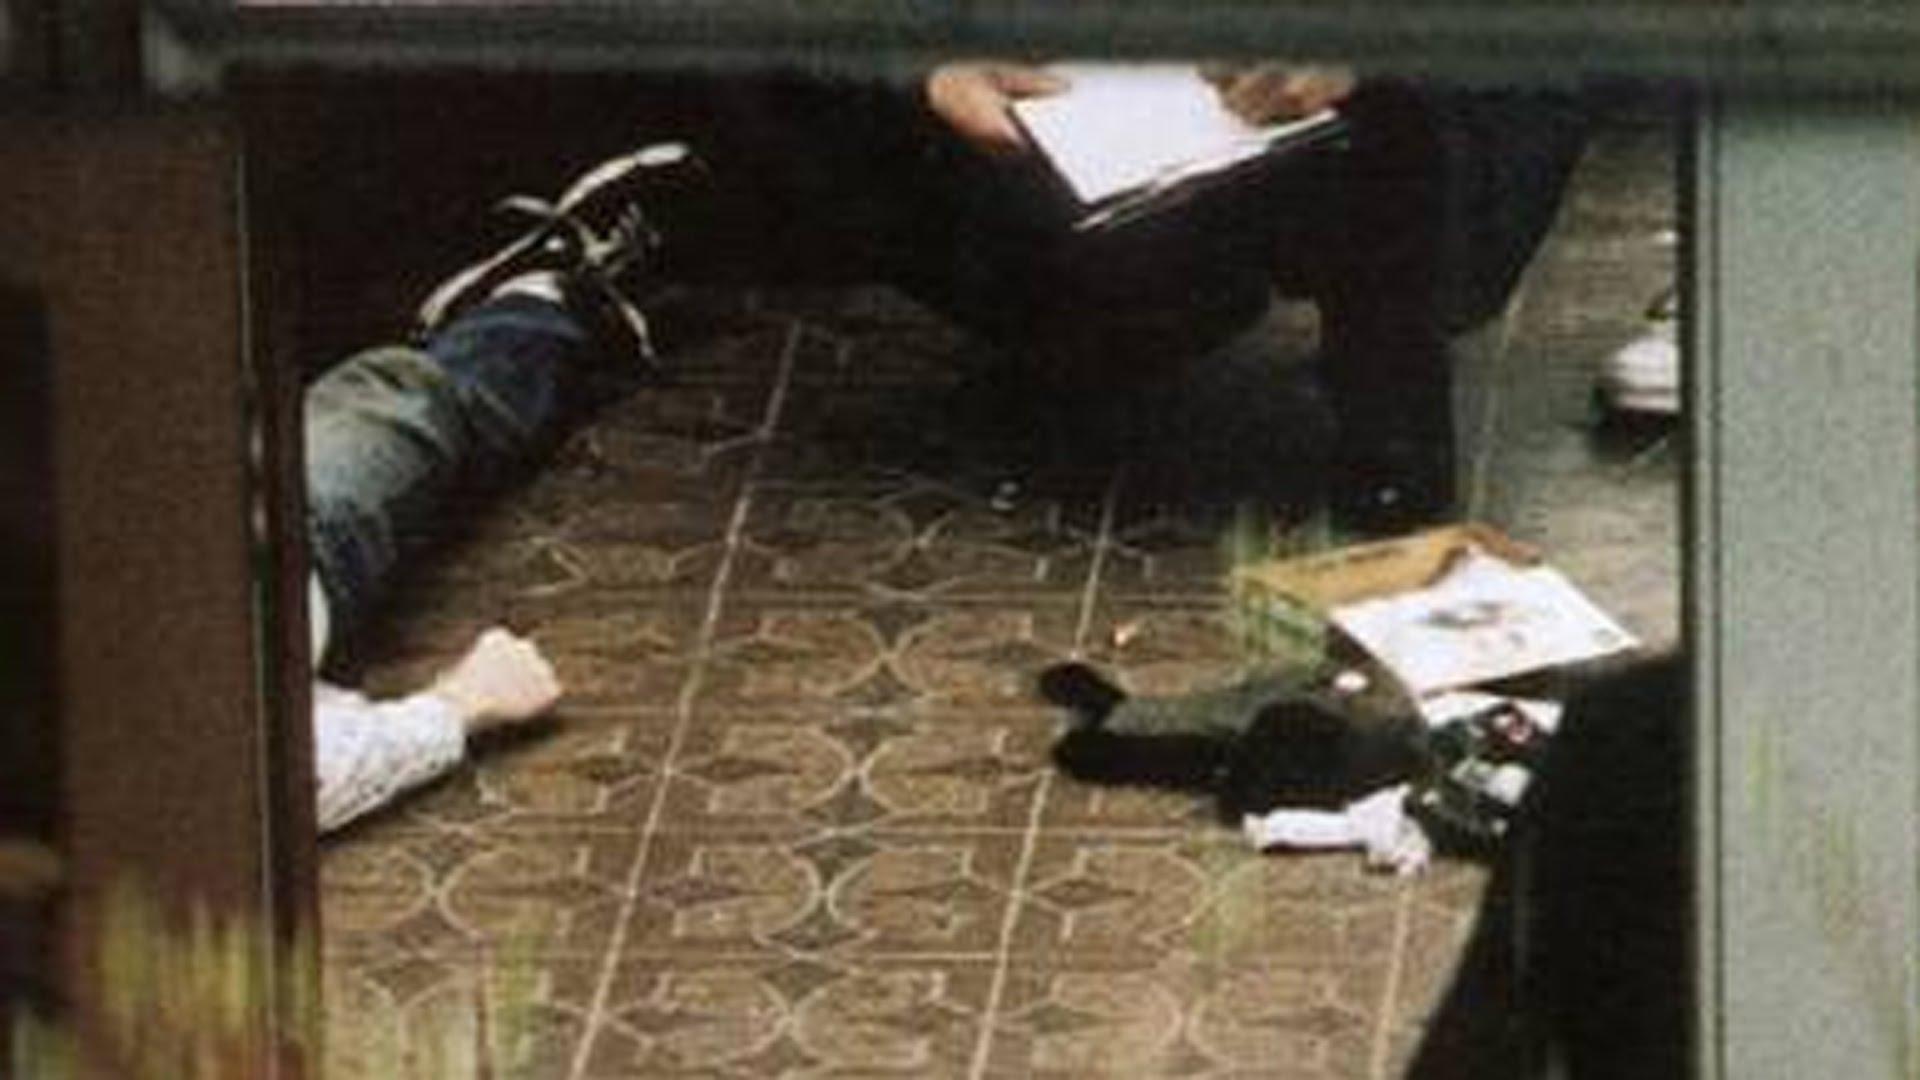 Benarkah Kurt Cobain Mati Dibunuh? Beginilah Kronologinya